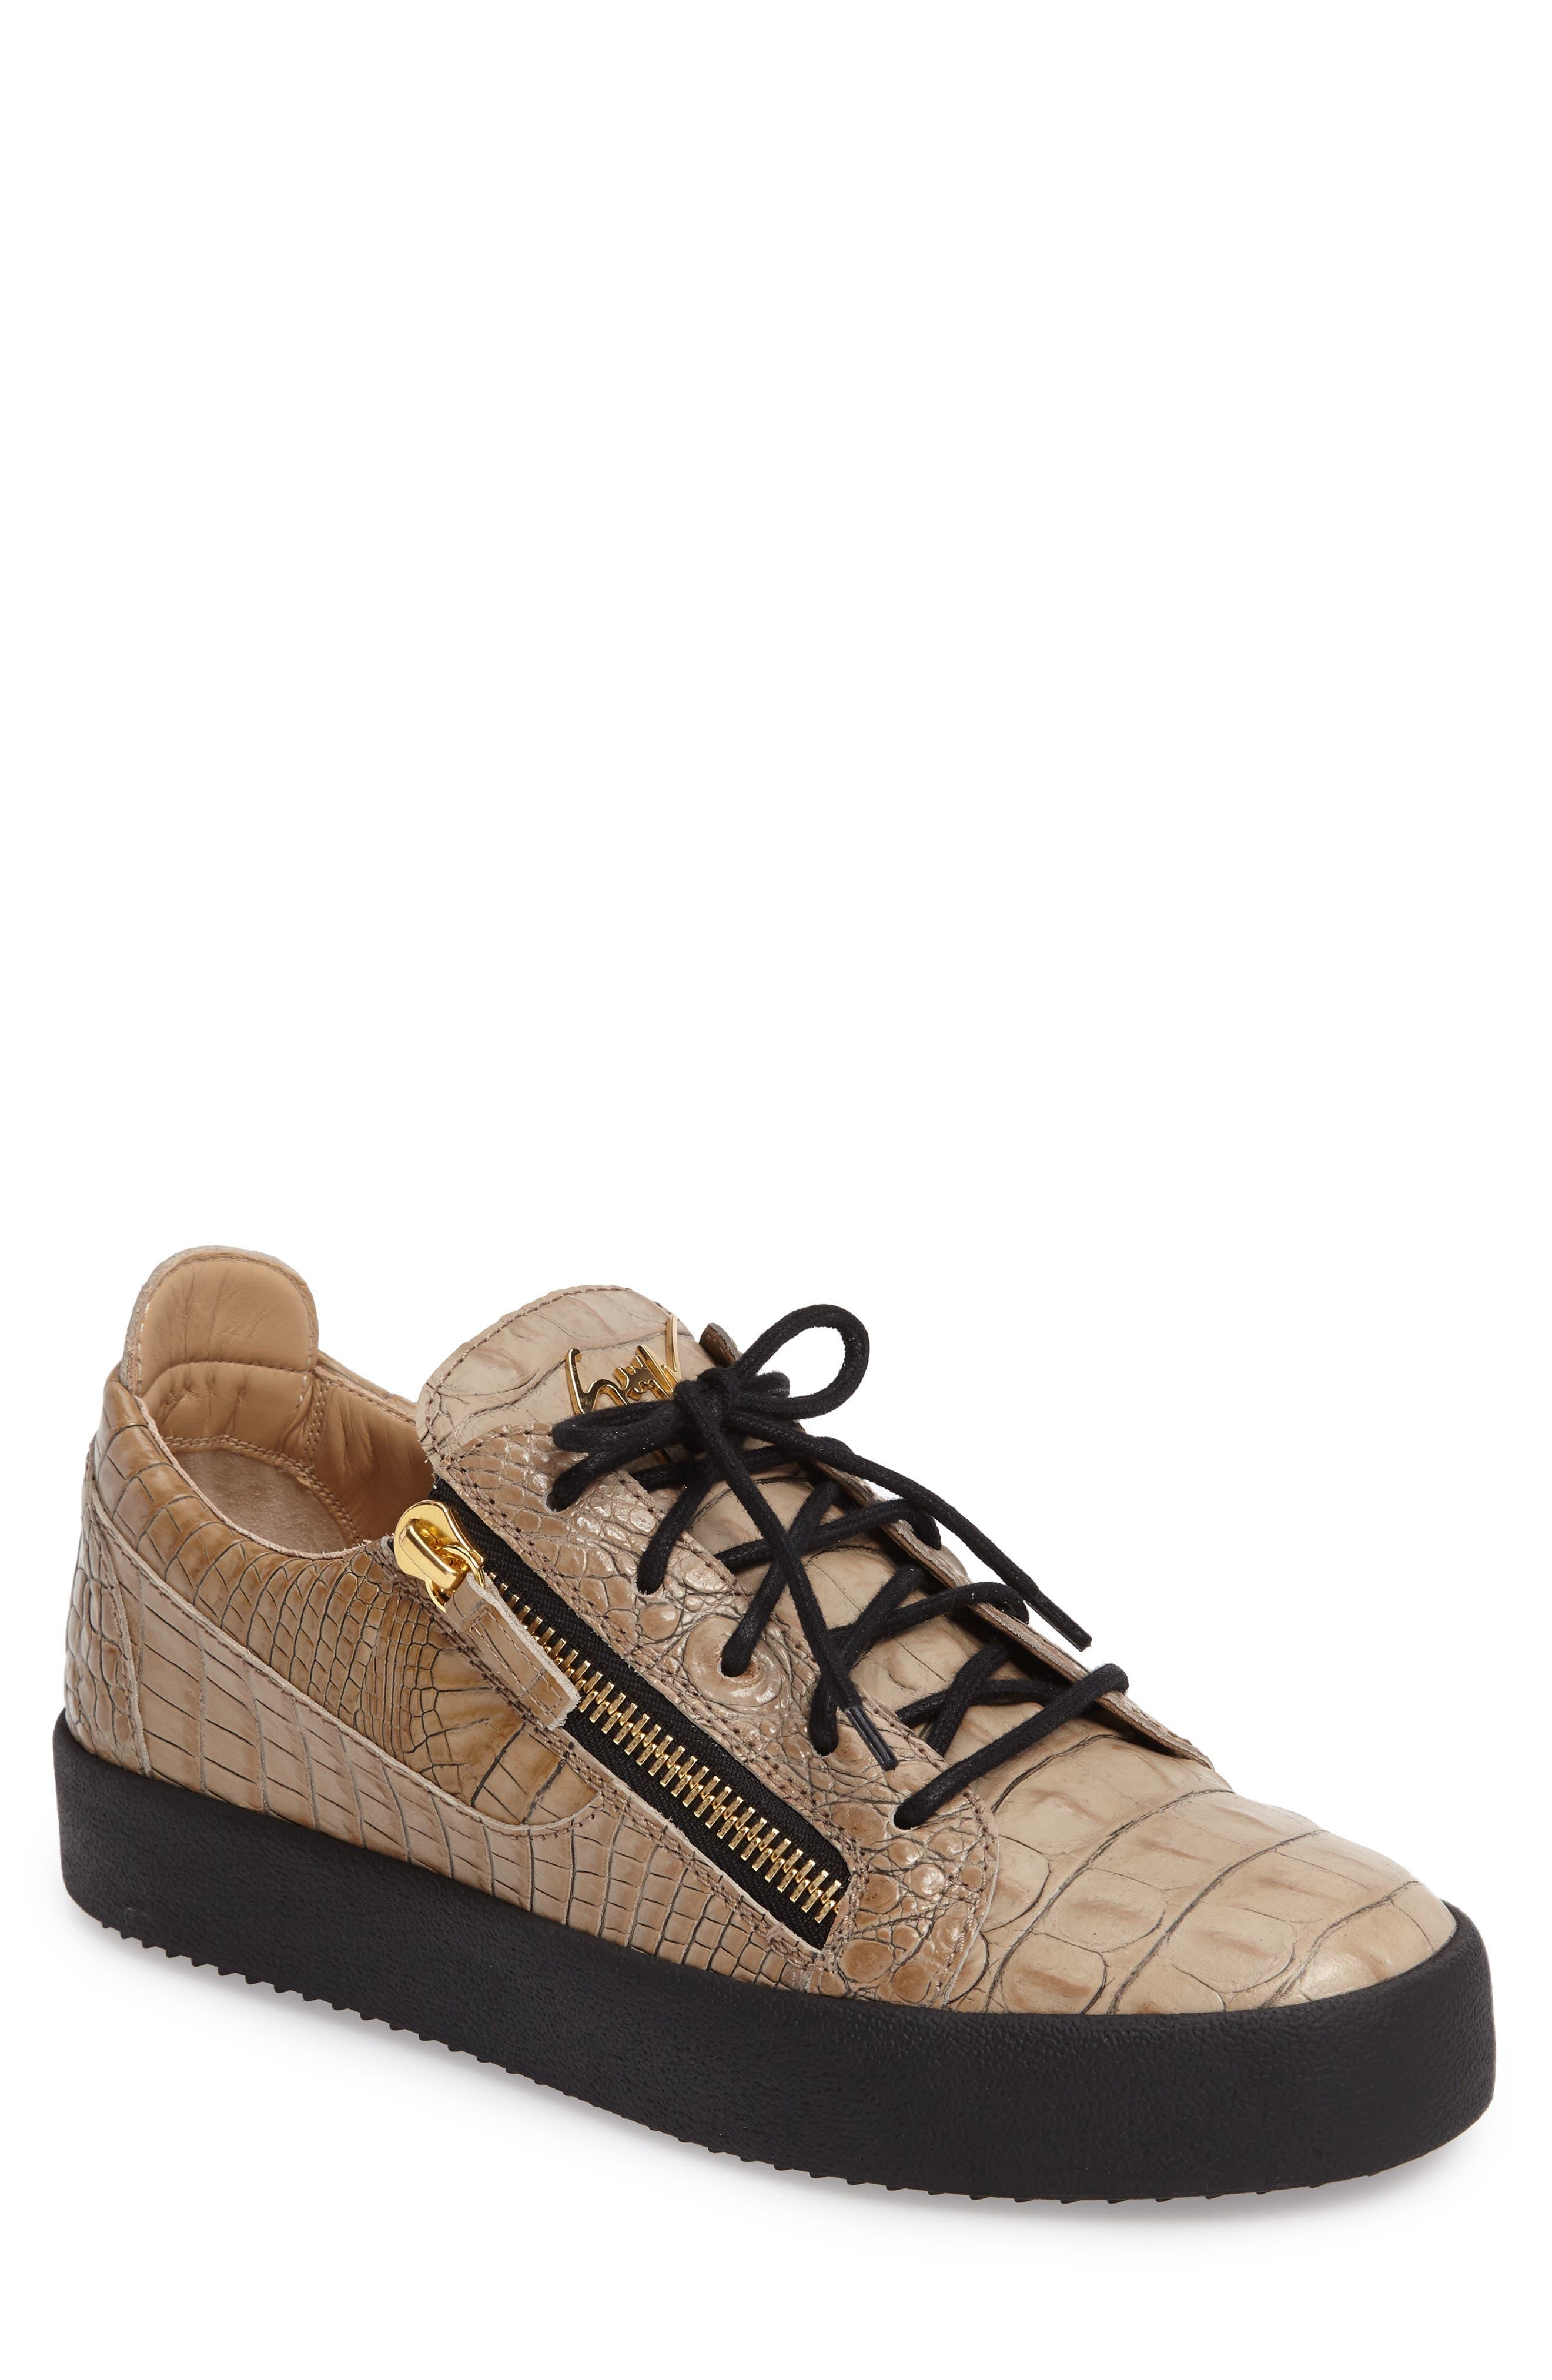 Alternate Image 1 Selected - Giuseppe Zanotti Low Top Sneaker (Men)